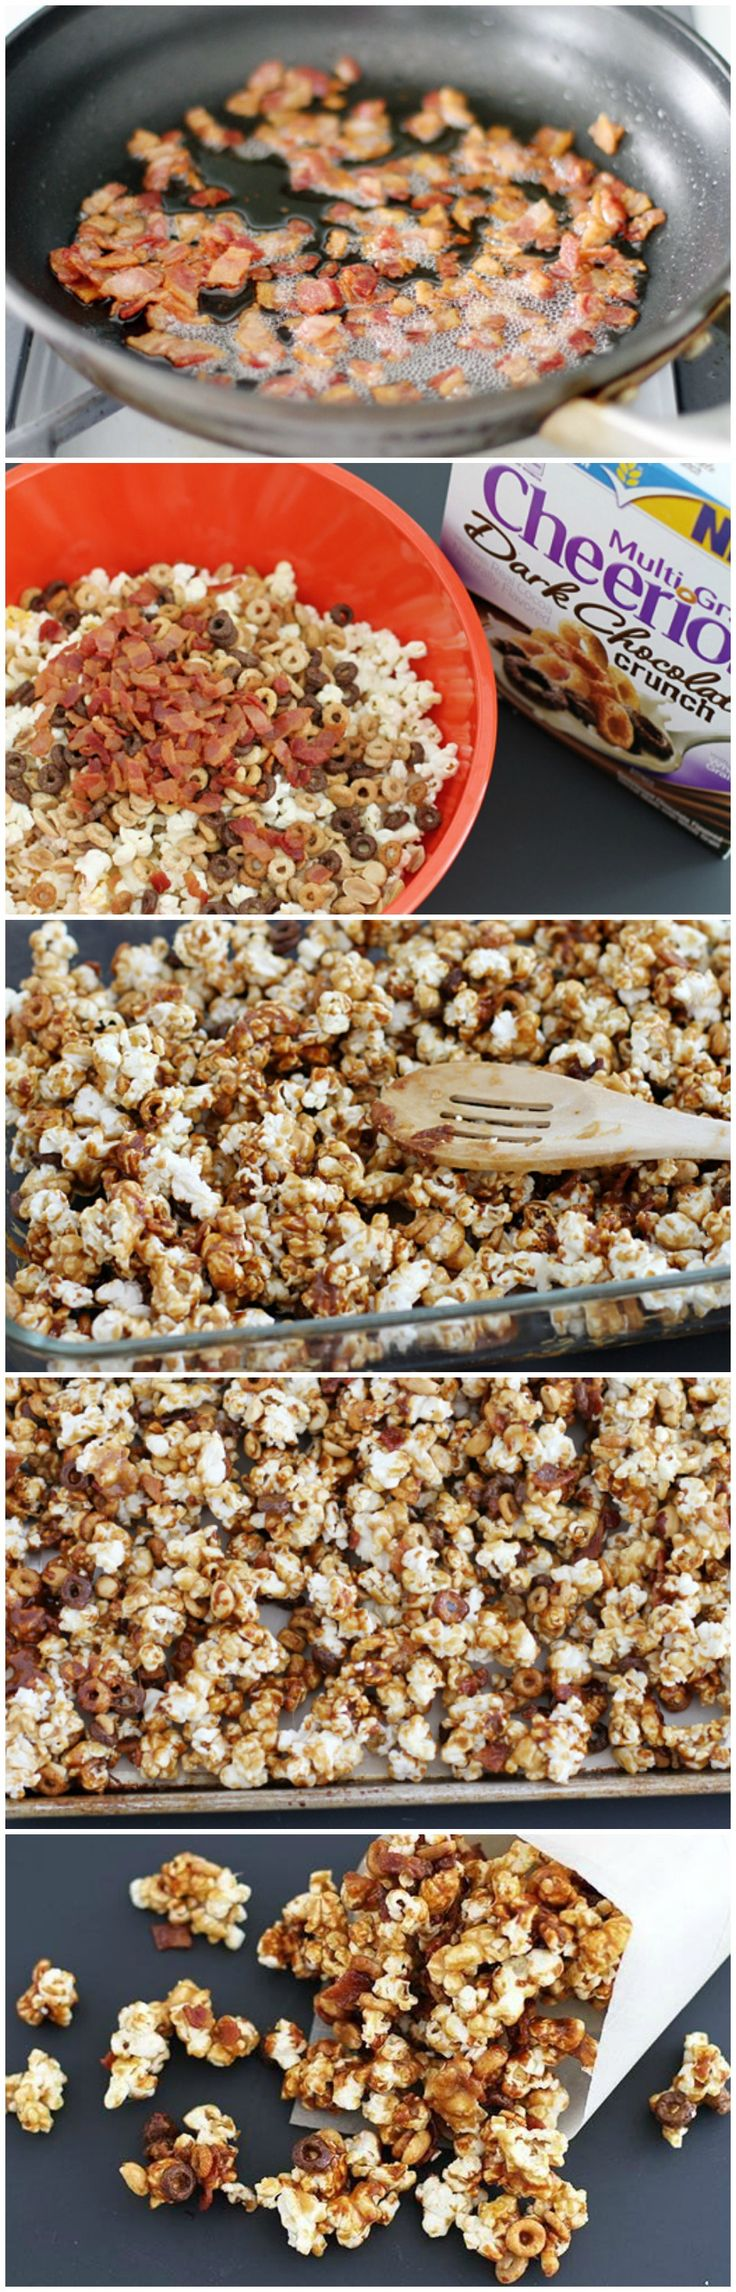 ... Bacon Popcorn on Pinterest | Popcorn, Popcorn Recipes and Popcorn